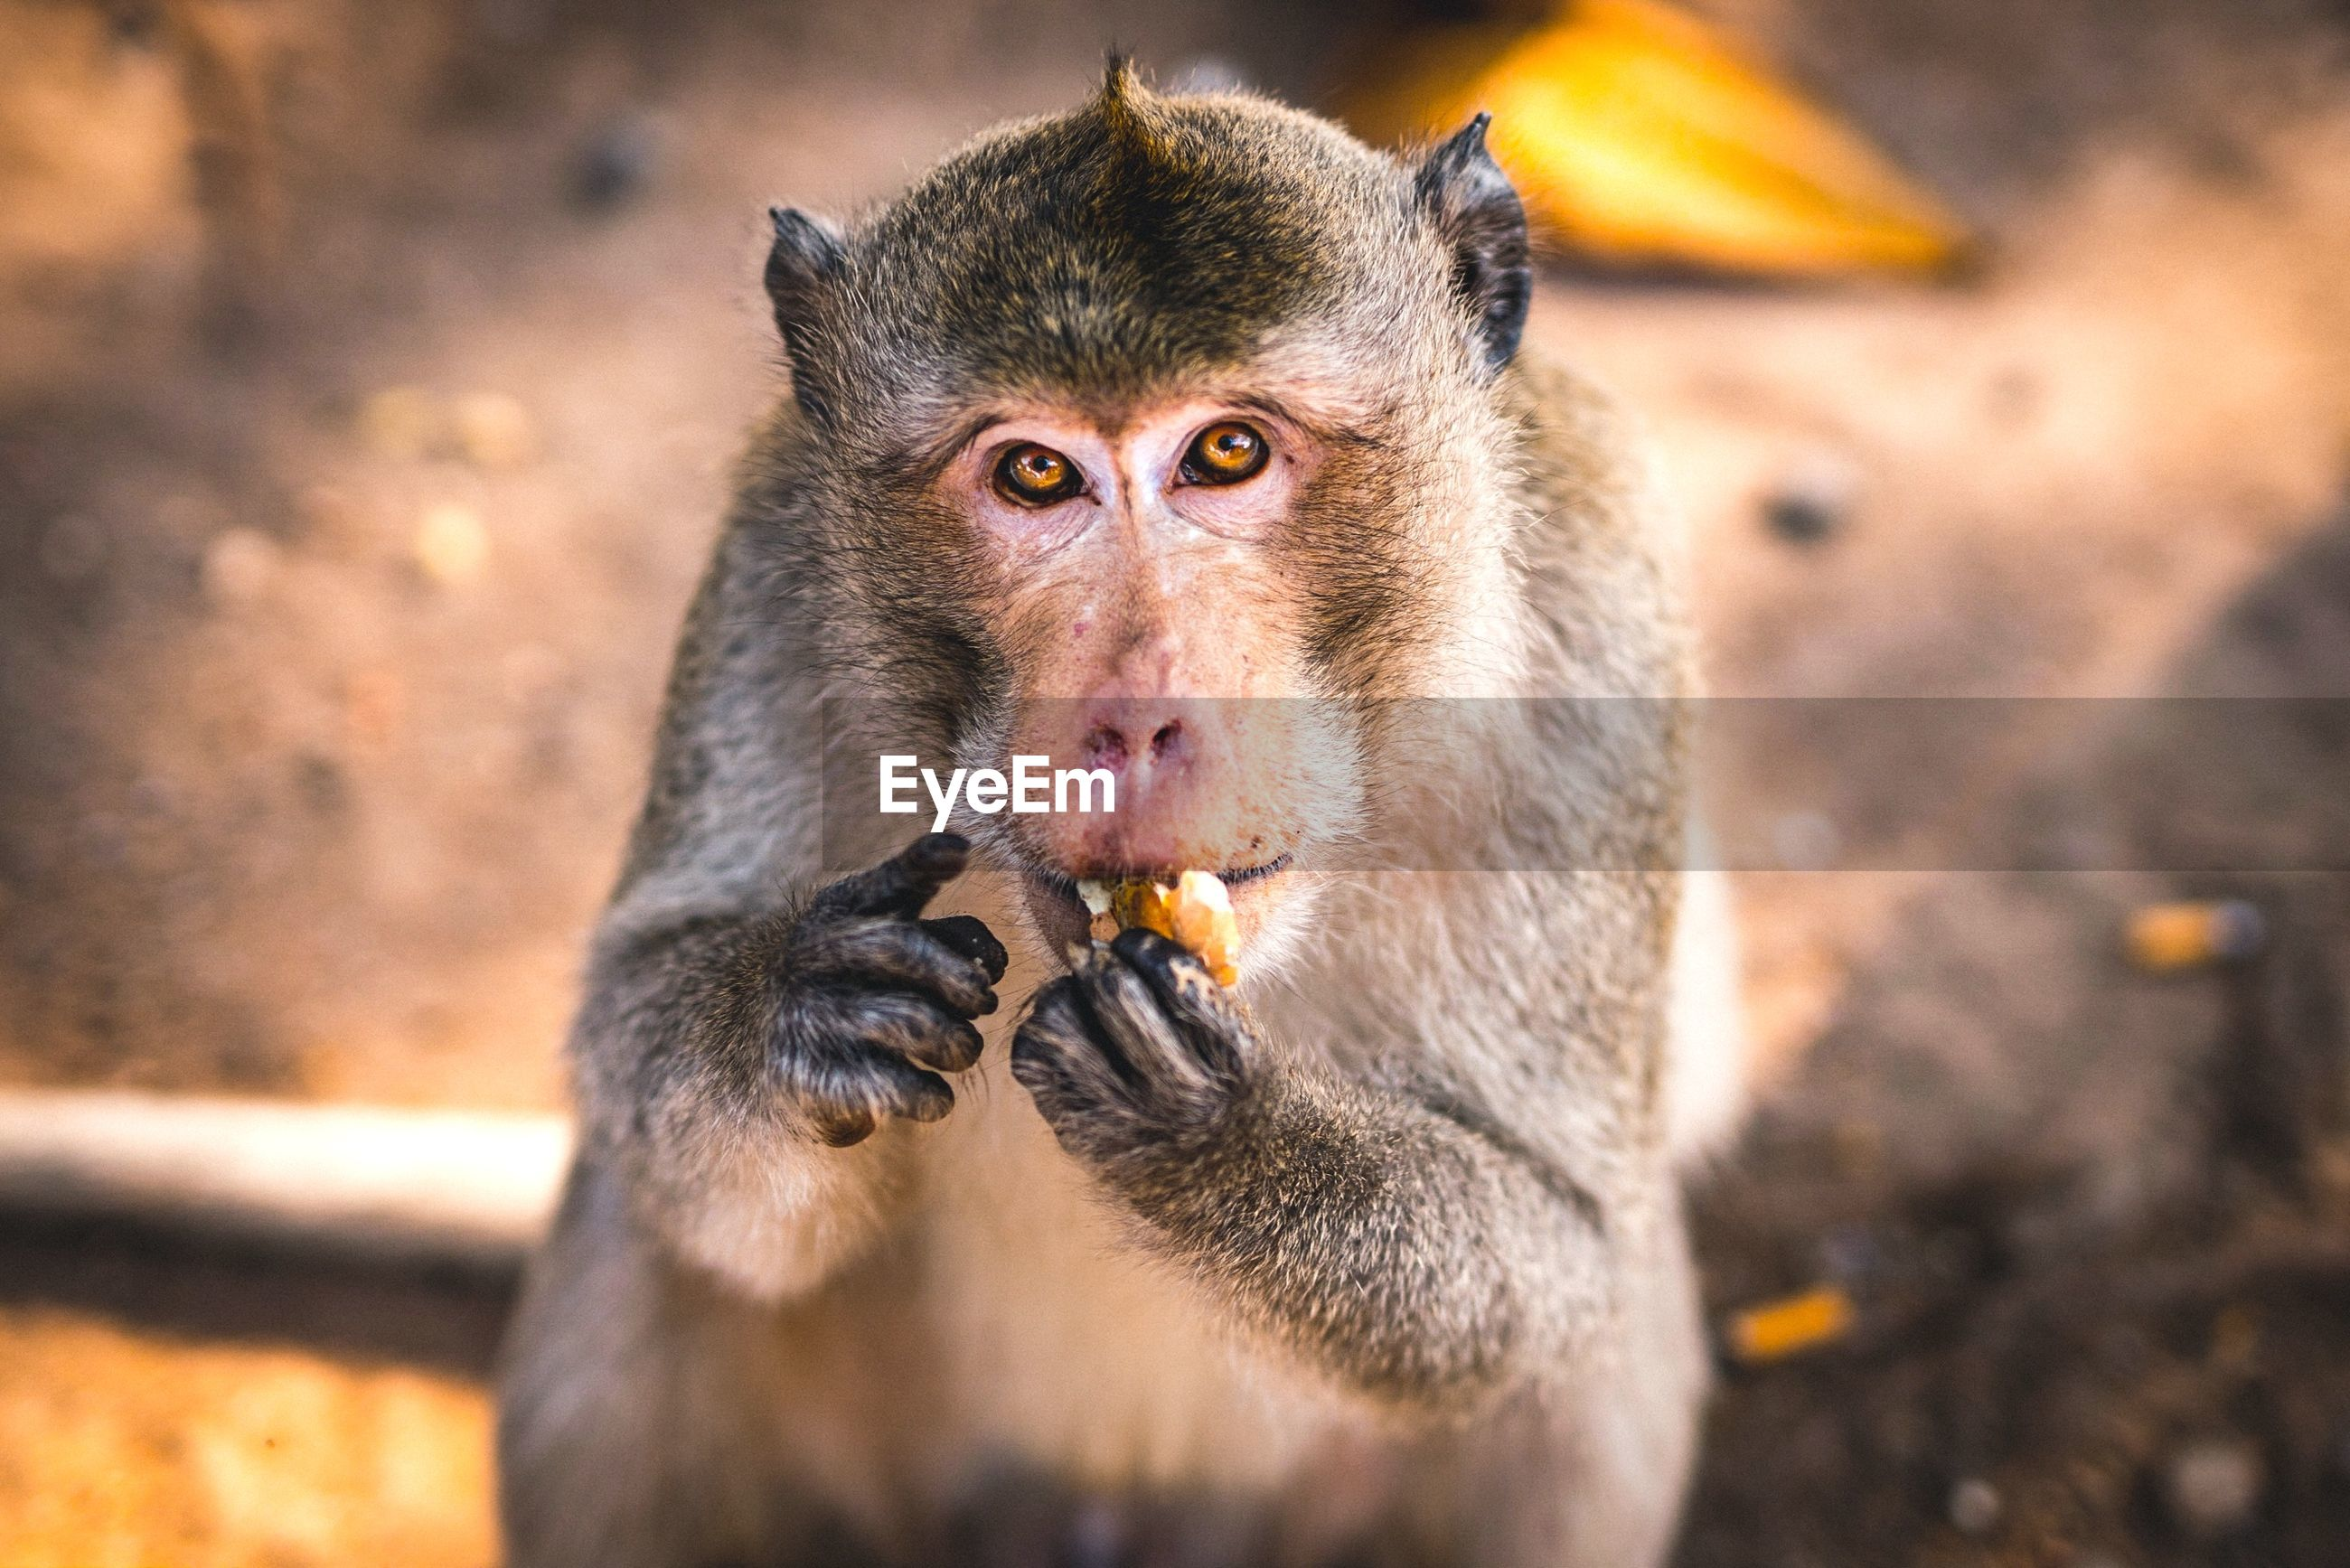 Close-up portrait of monkey eating food